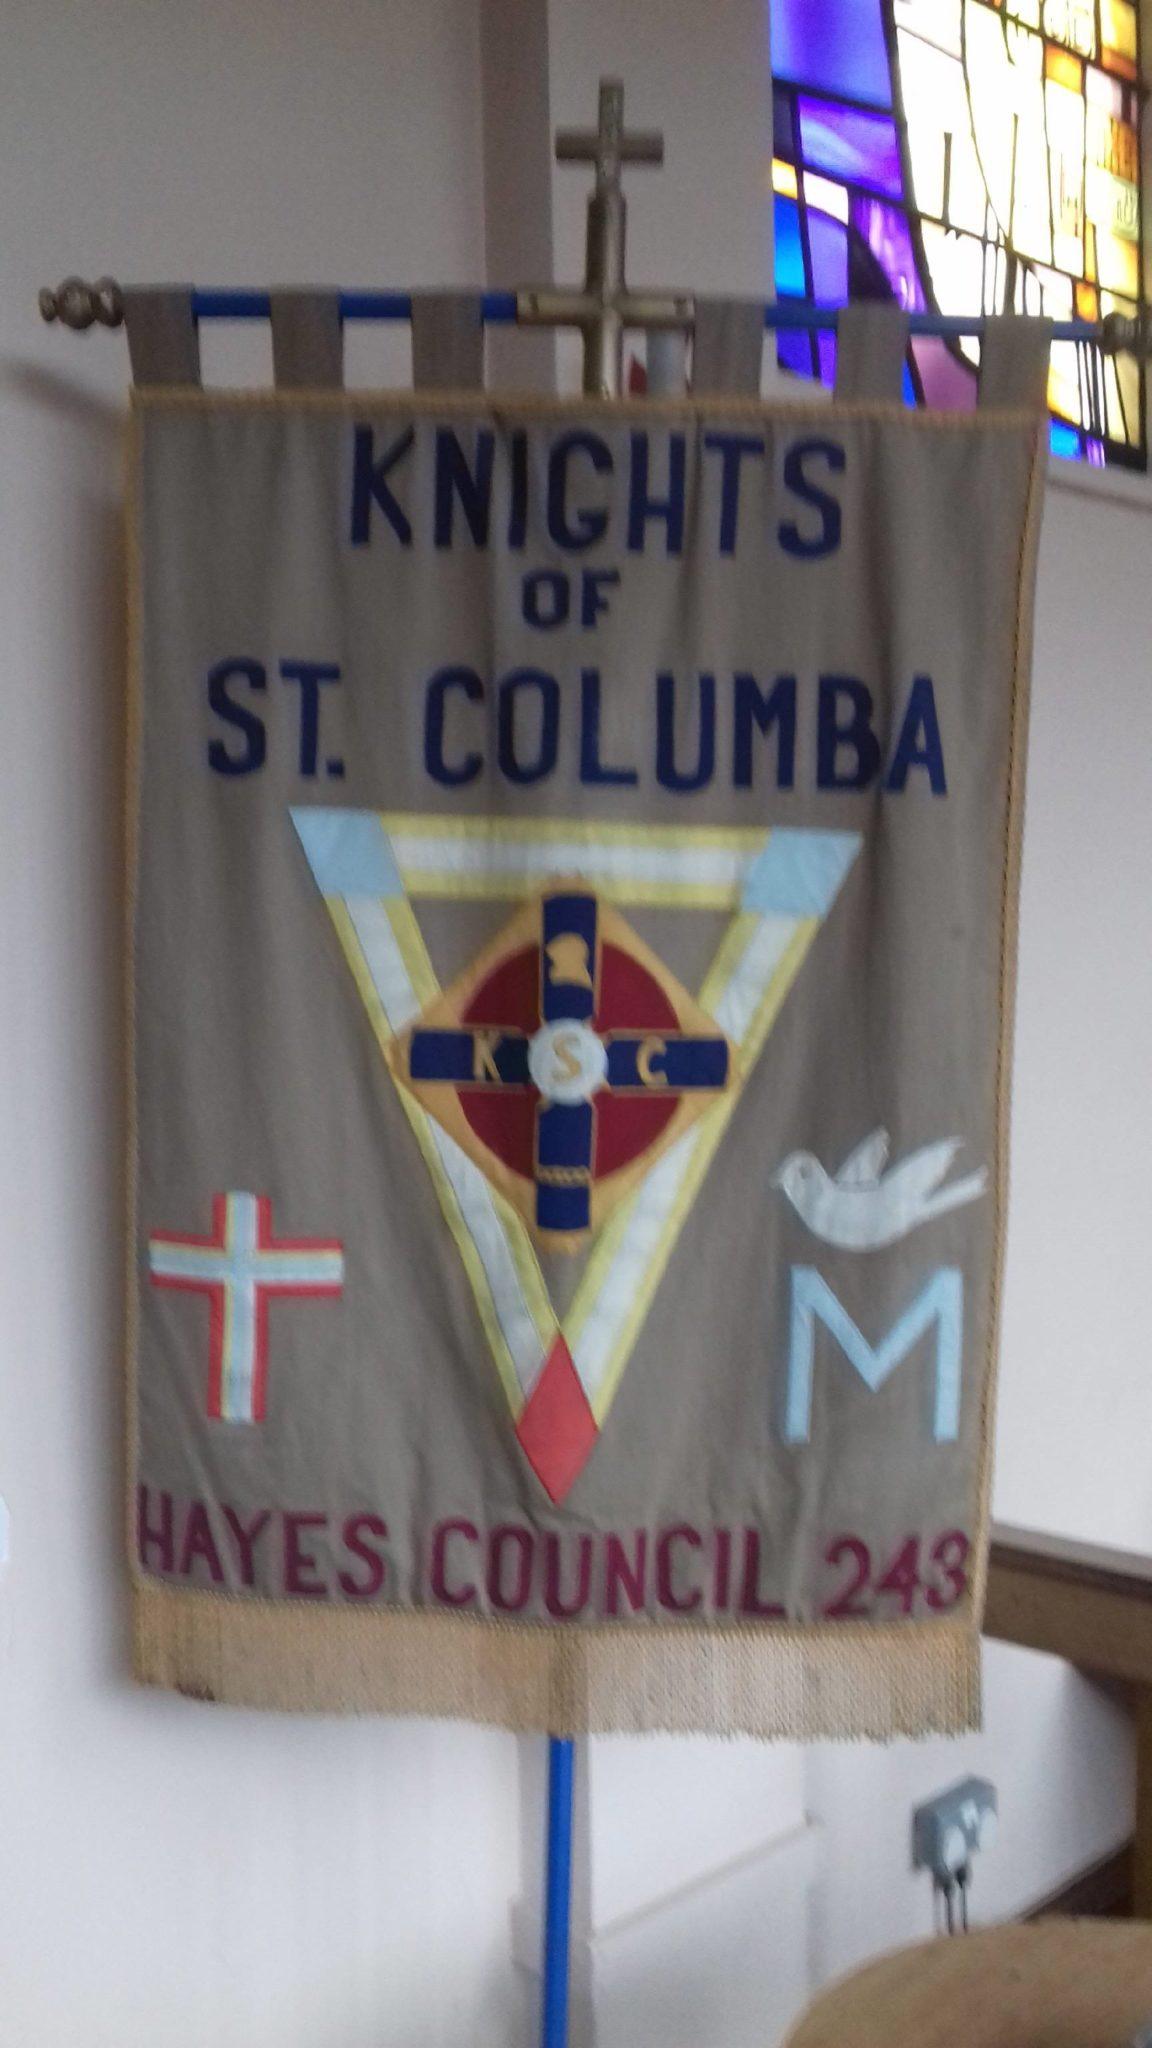 Knights of Columba 1